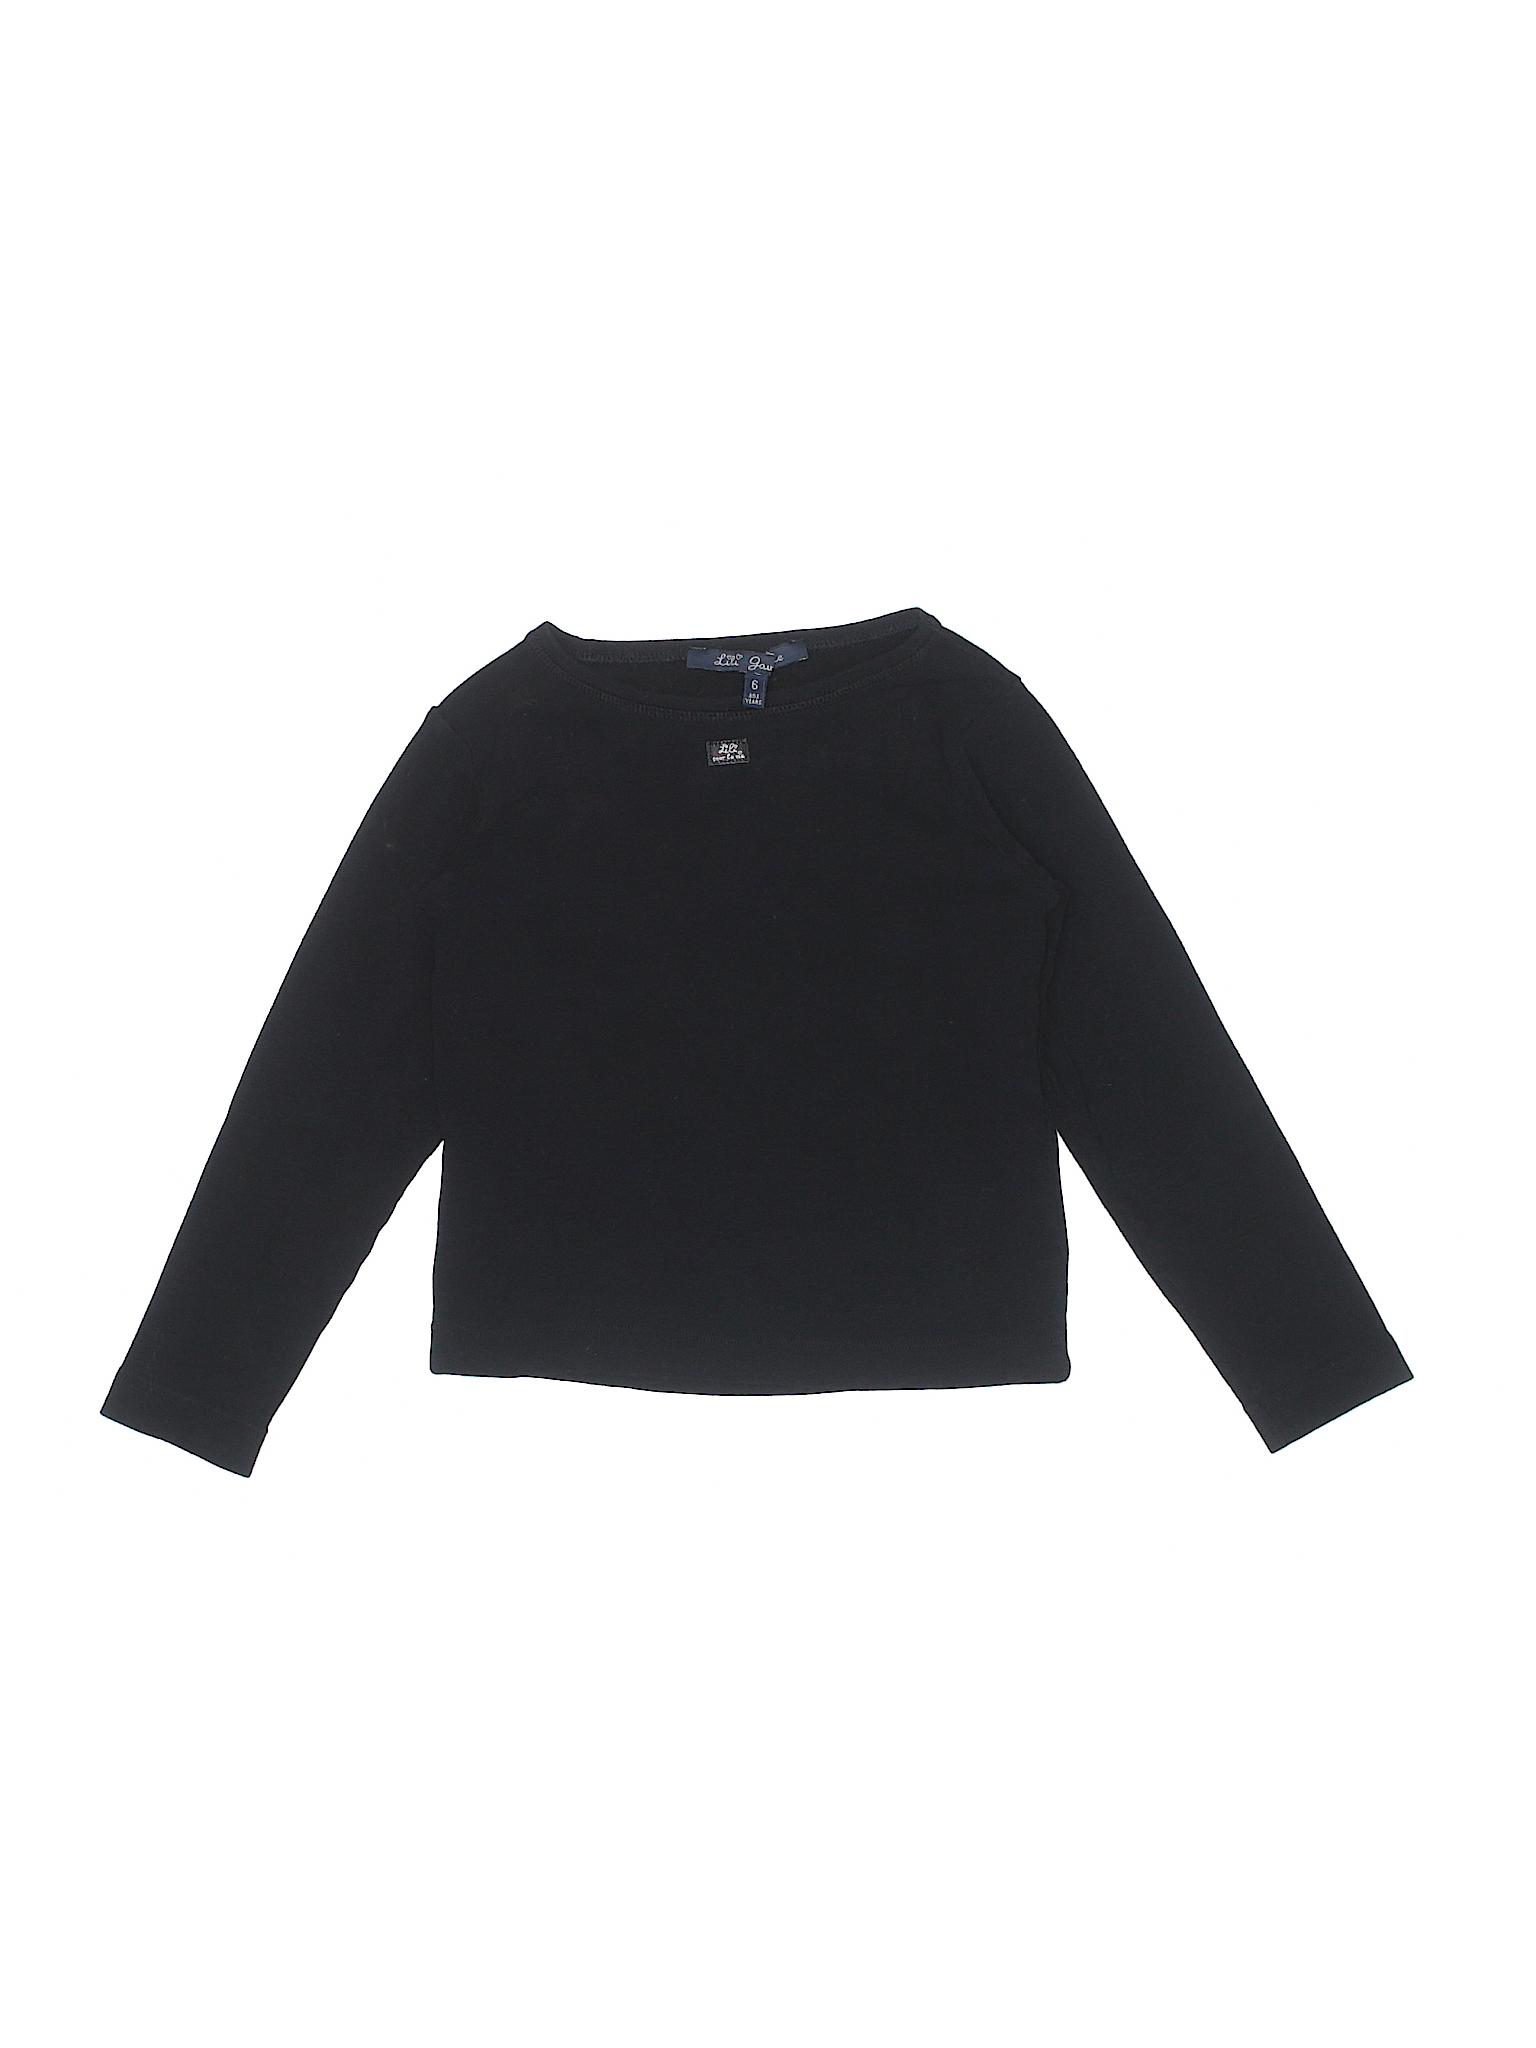 3fb44f983c60 Lili Gaufrette Solid Black Long Sleeve T-Shirt Size 6 - 95% off ...